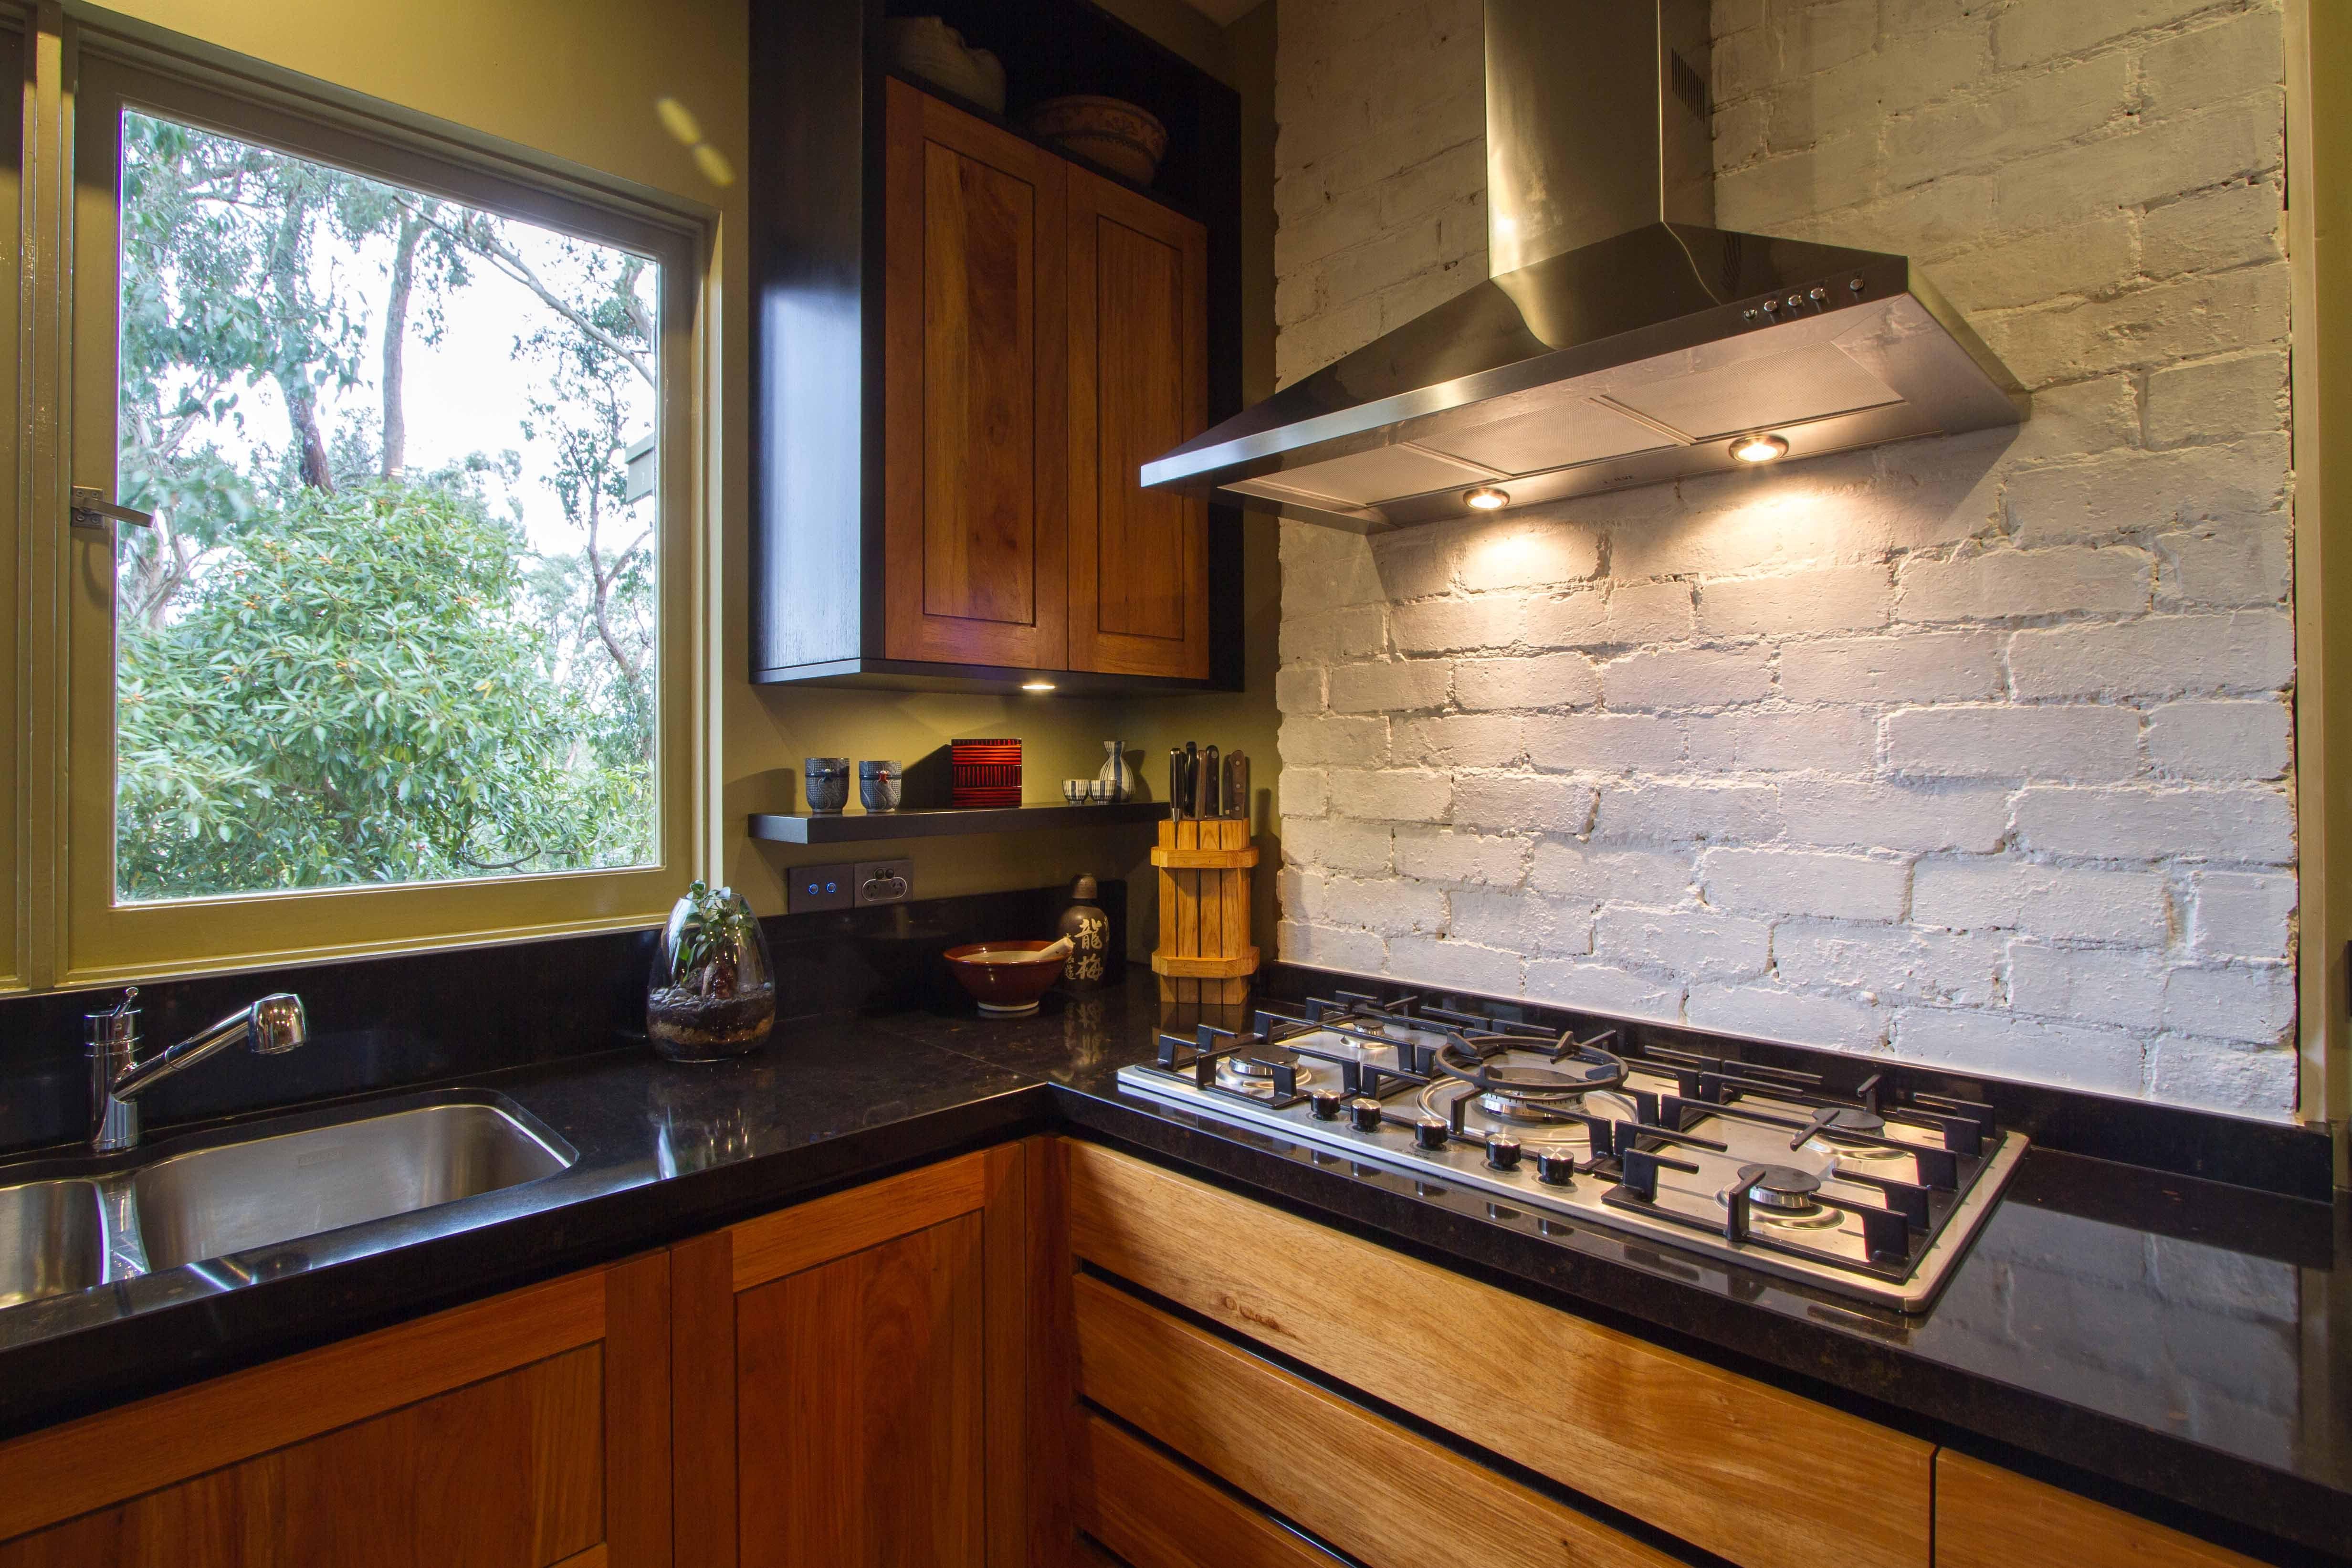 Stunning Japanese Timber Kitchen Painted Brick Splashback Www Thekitchendesigncentre Com Au Thekitchen Designce Japanese Kitchen Japanese Furniture Kitchen